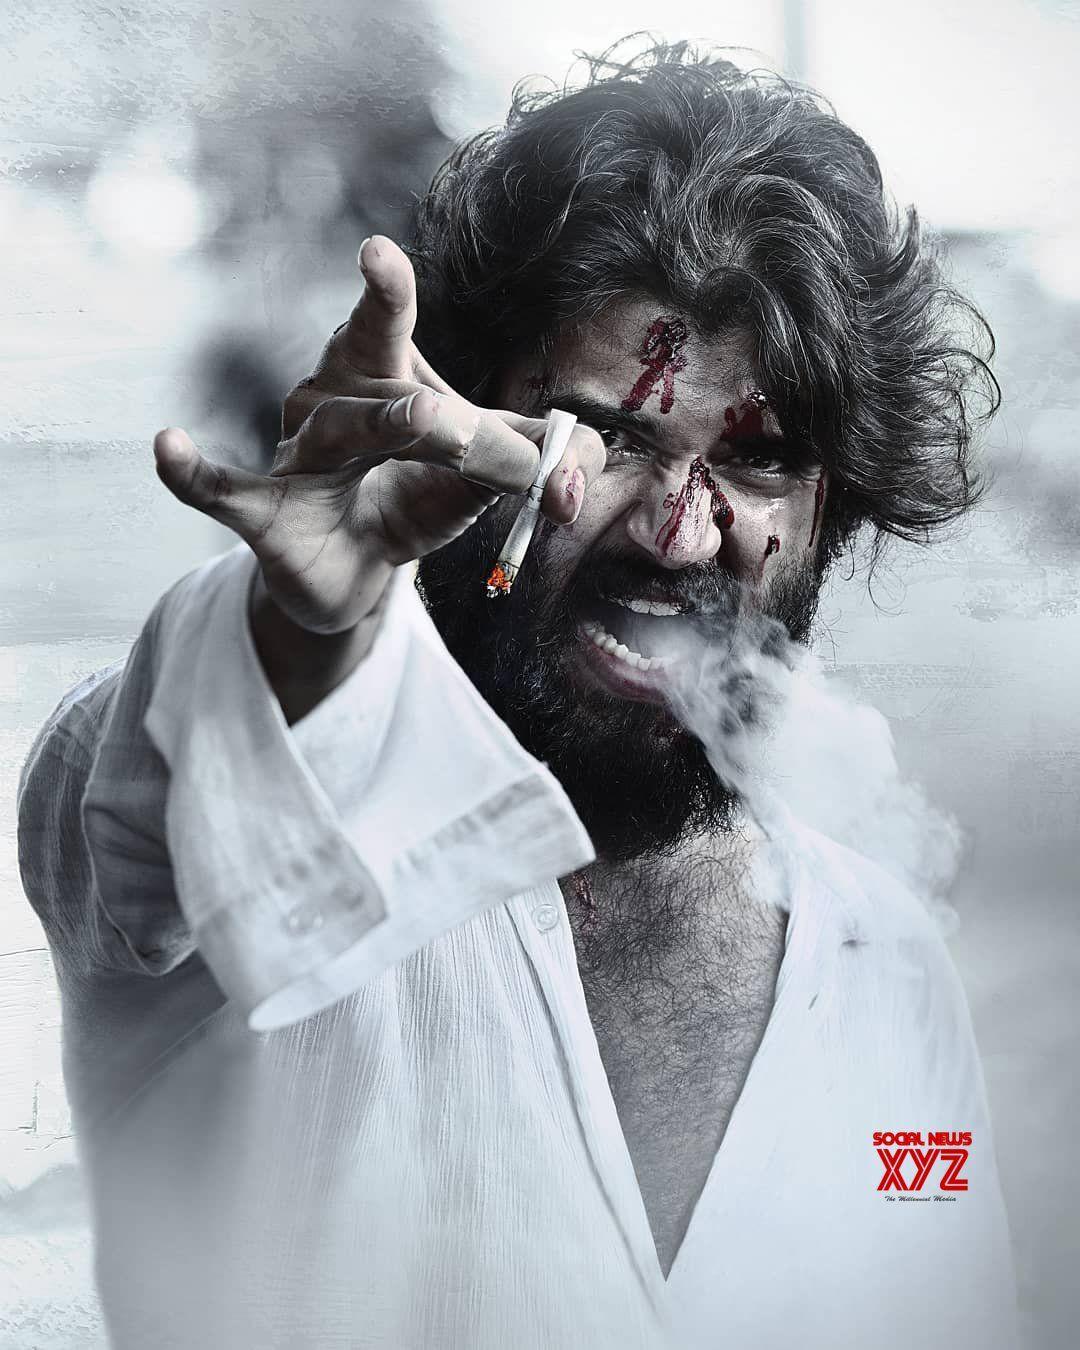 Vijay Deverakonda S World Famous Lover Movie Still Social News Xyz Galaxy Pictures Movie Lover Actor Picture 1080p full hd 1080p arjun reddy hd